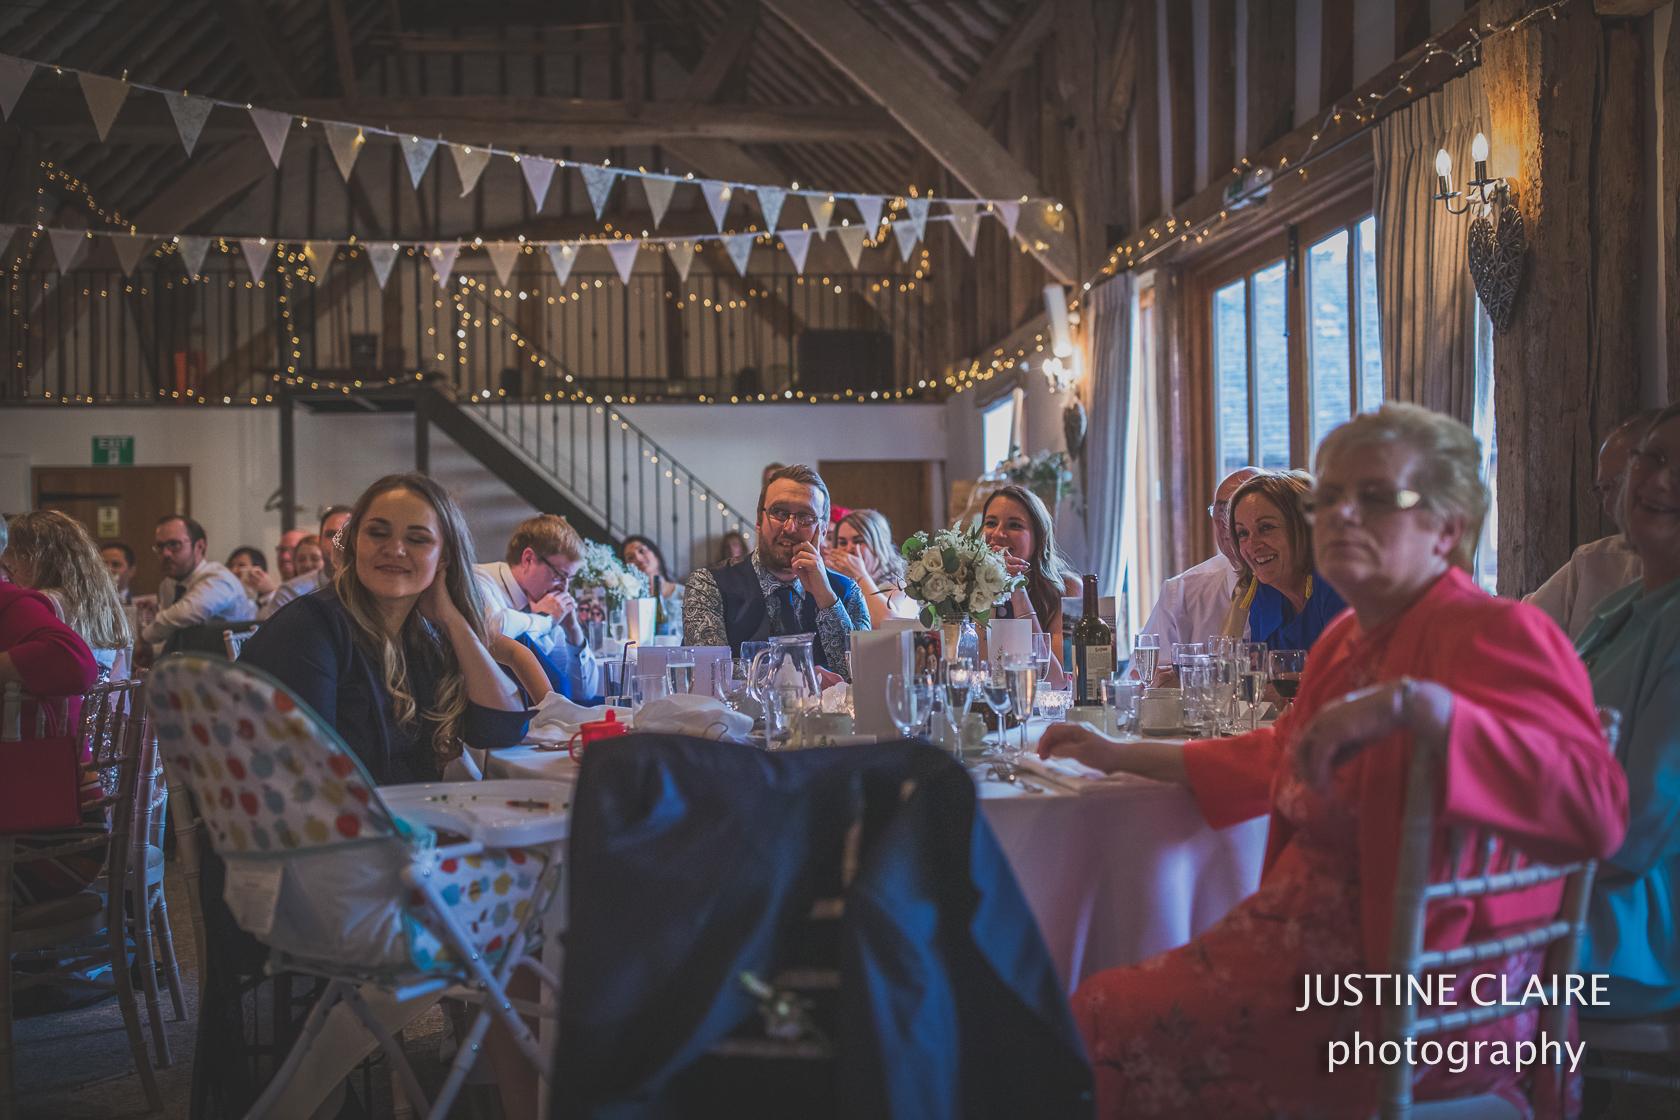 Fitzleroi Fittleworth petworth Billingshurst farm Wedding Photography by Justine Claire photographer Arundel Worthing Brighton-56.jpg